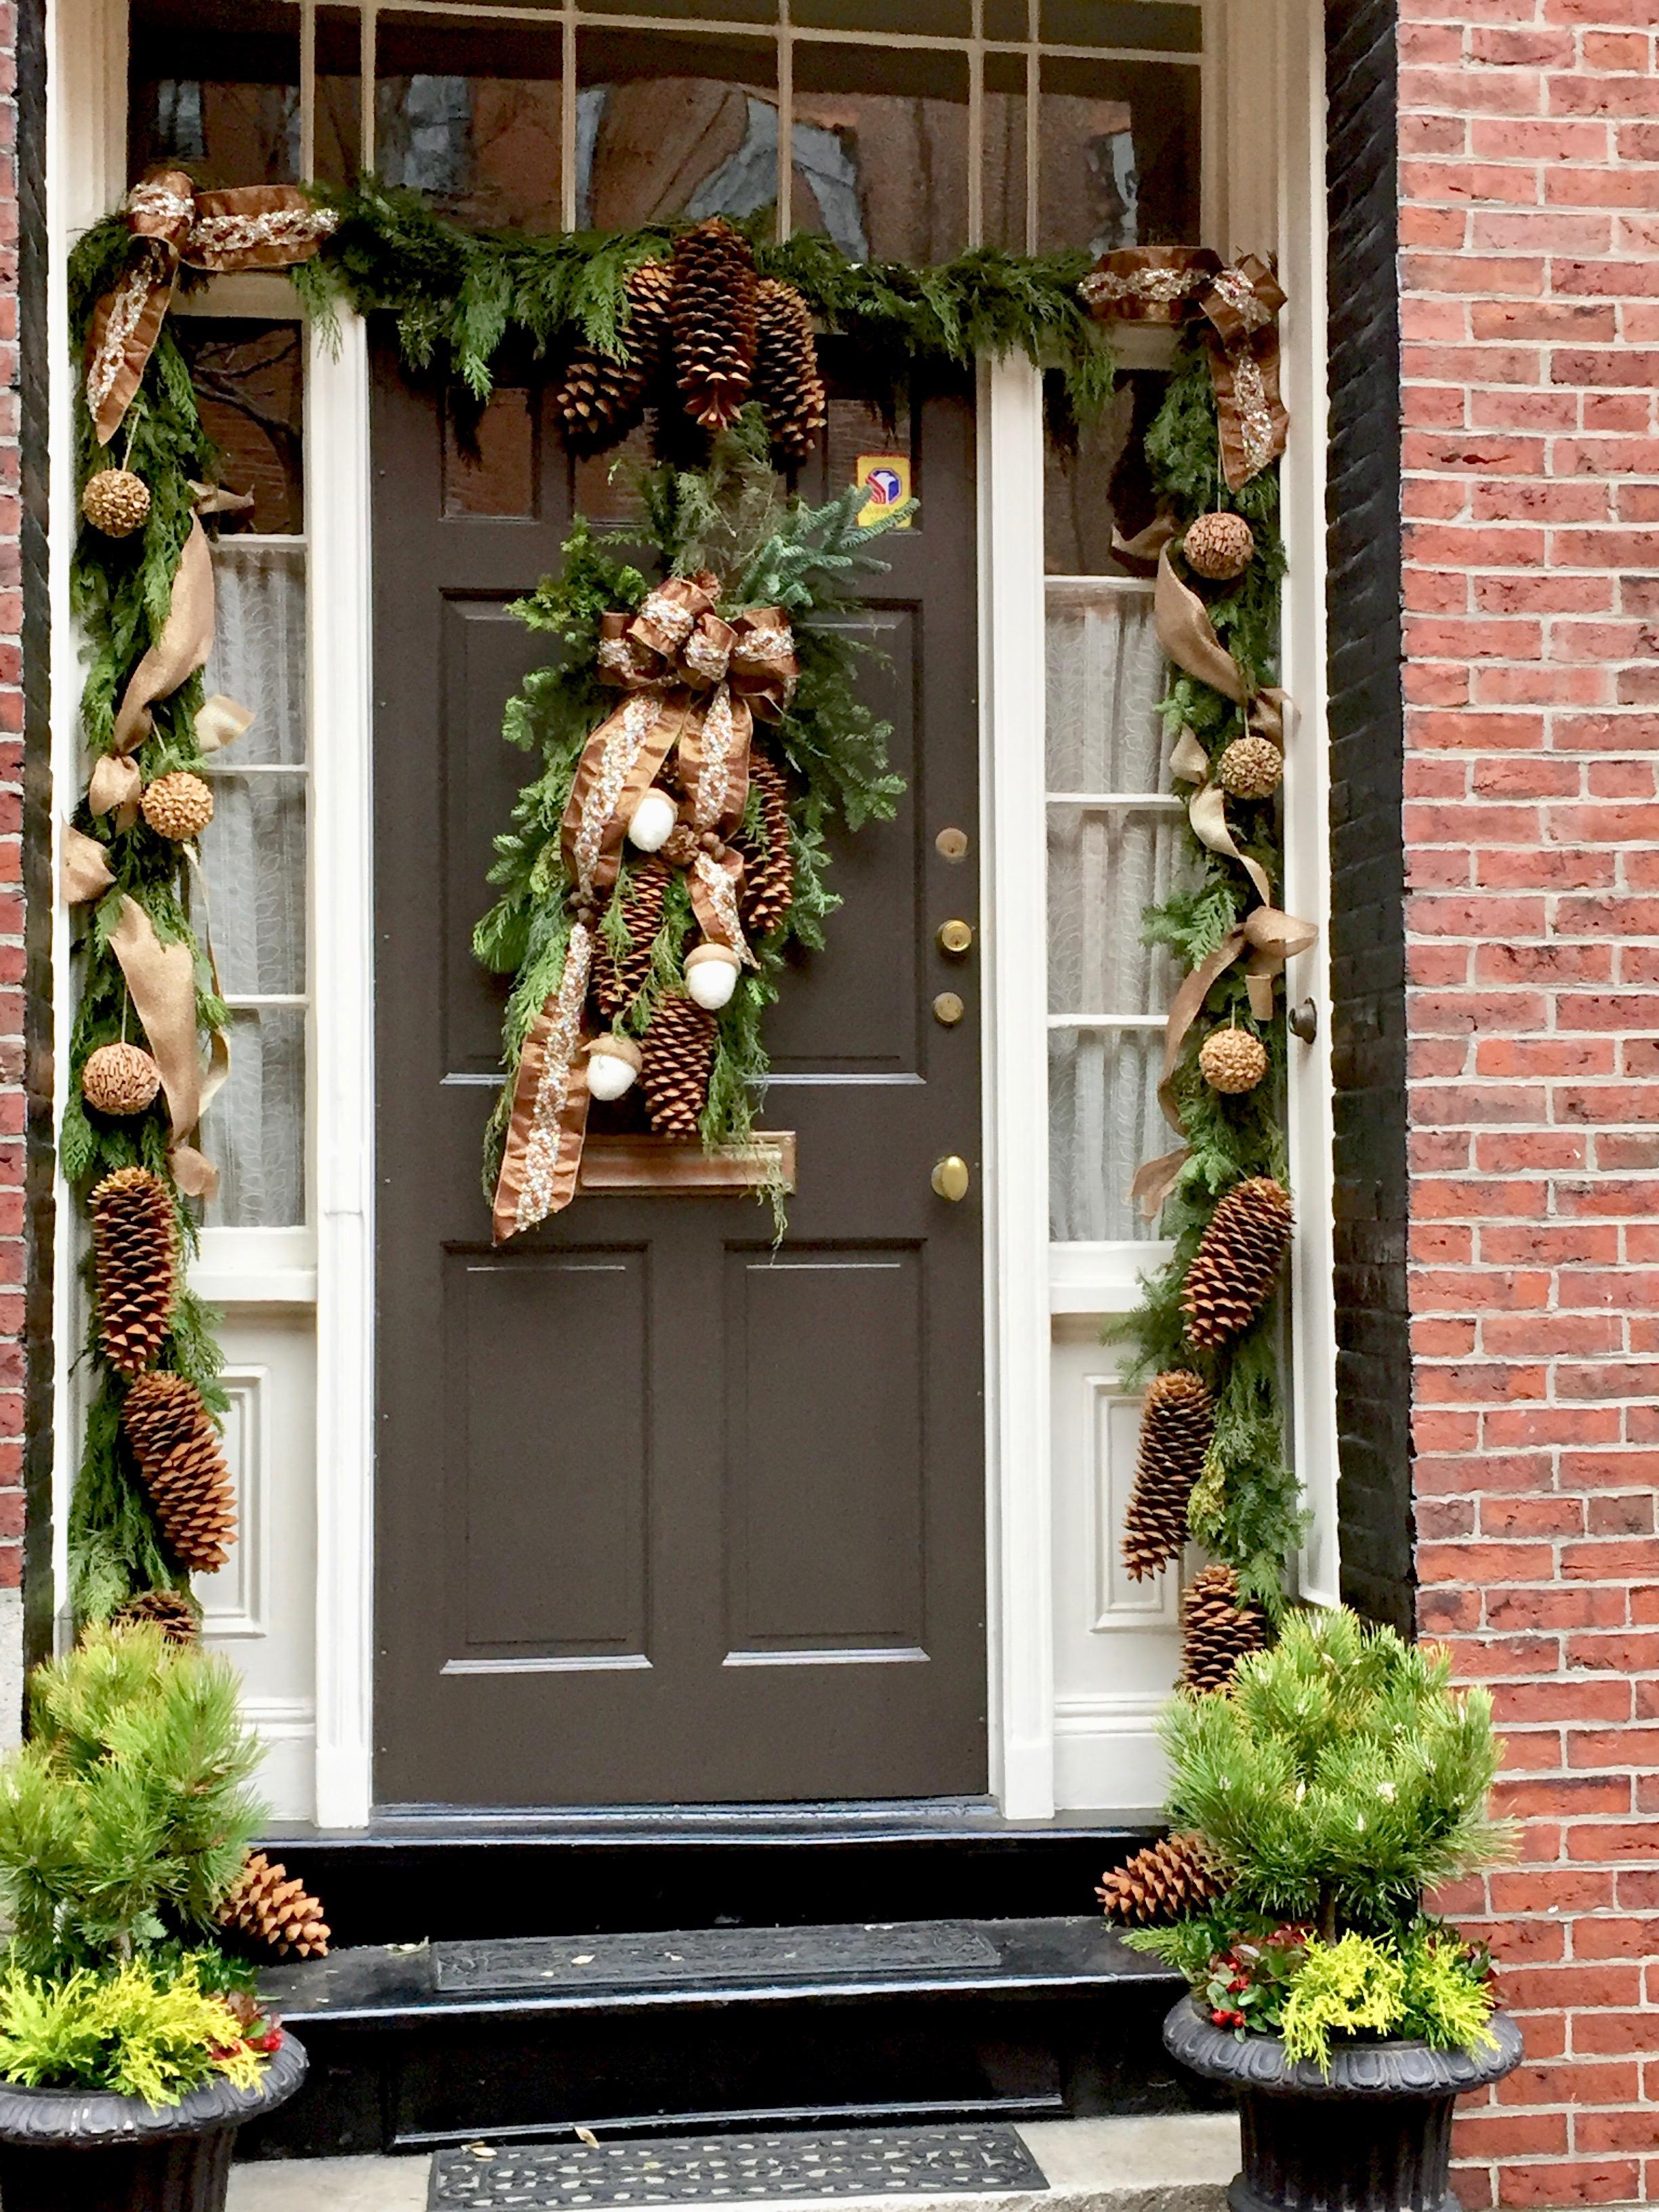 Pinecone Christmas Front Door Beacon Hill Boston MA New England.jpg